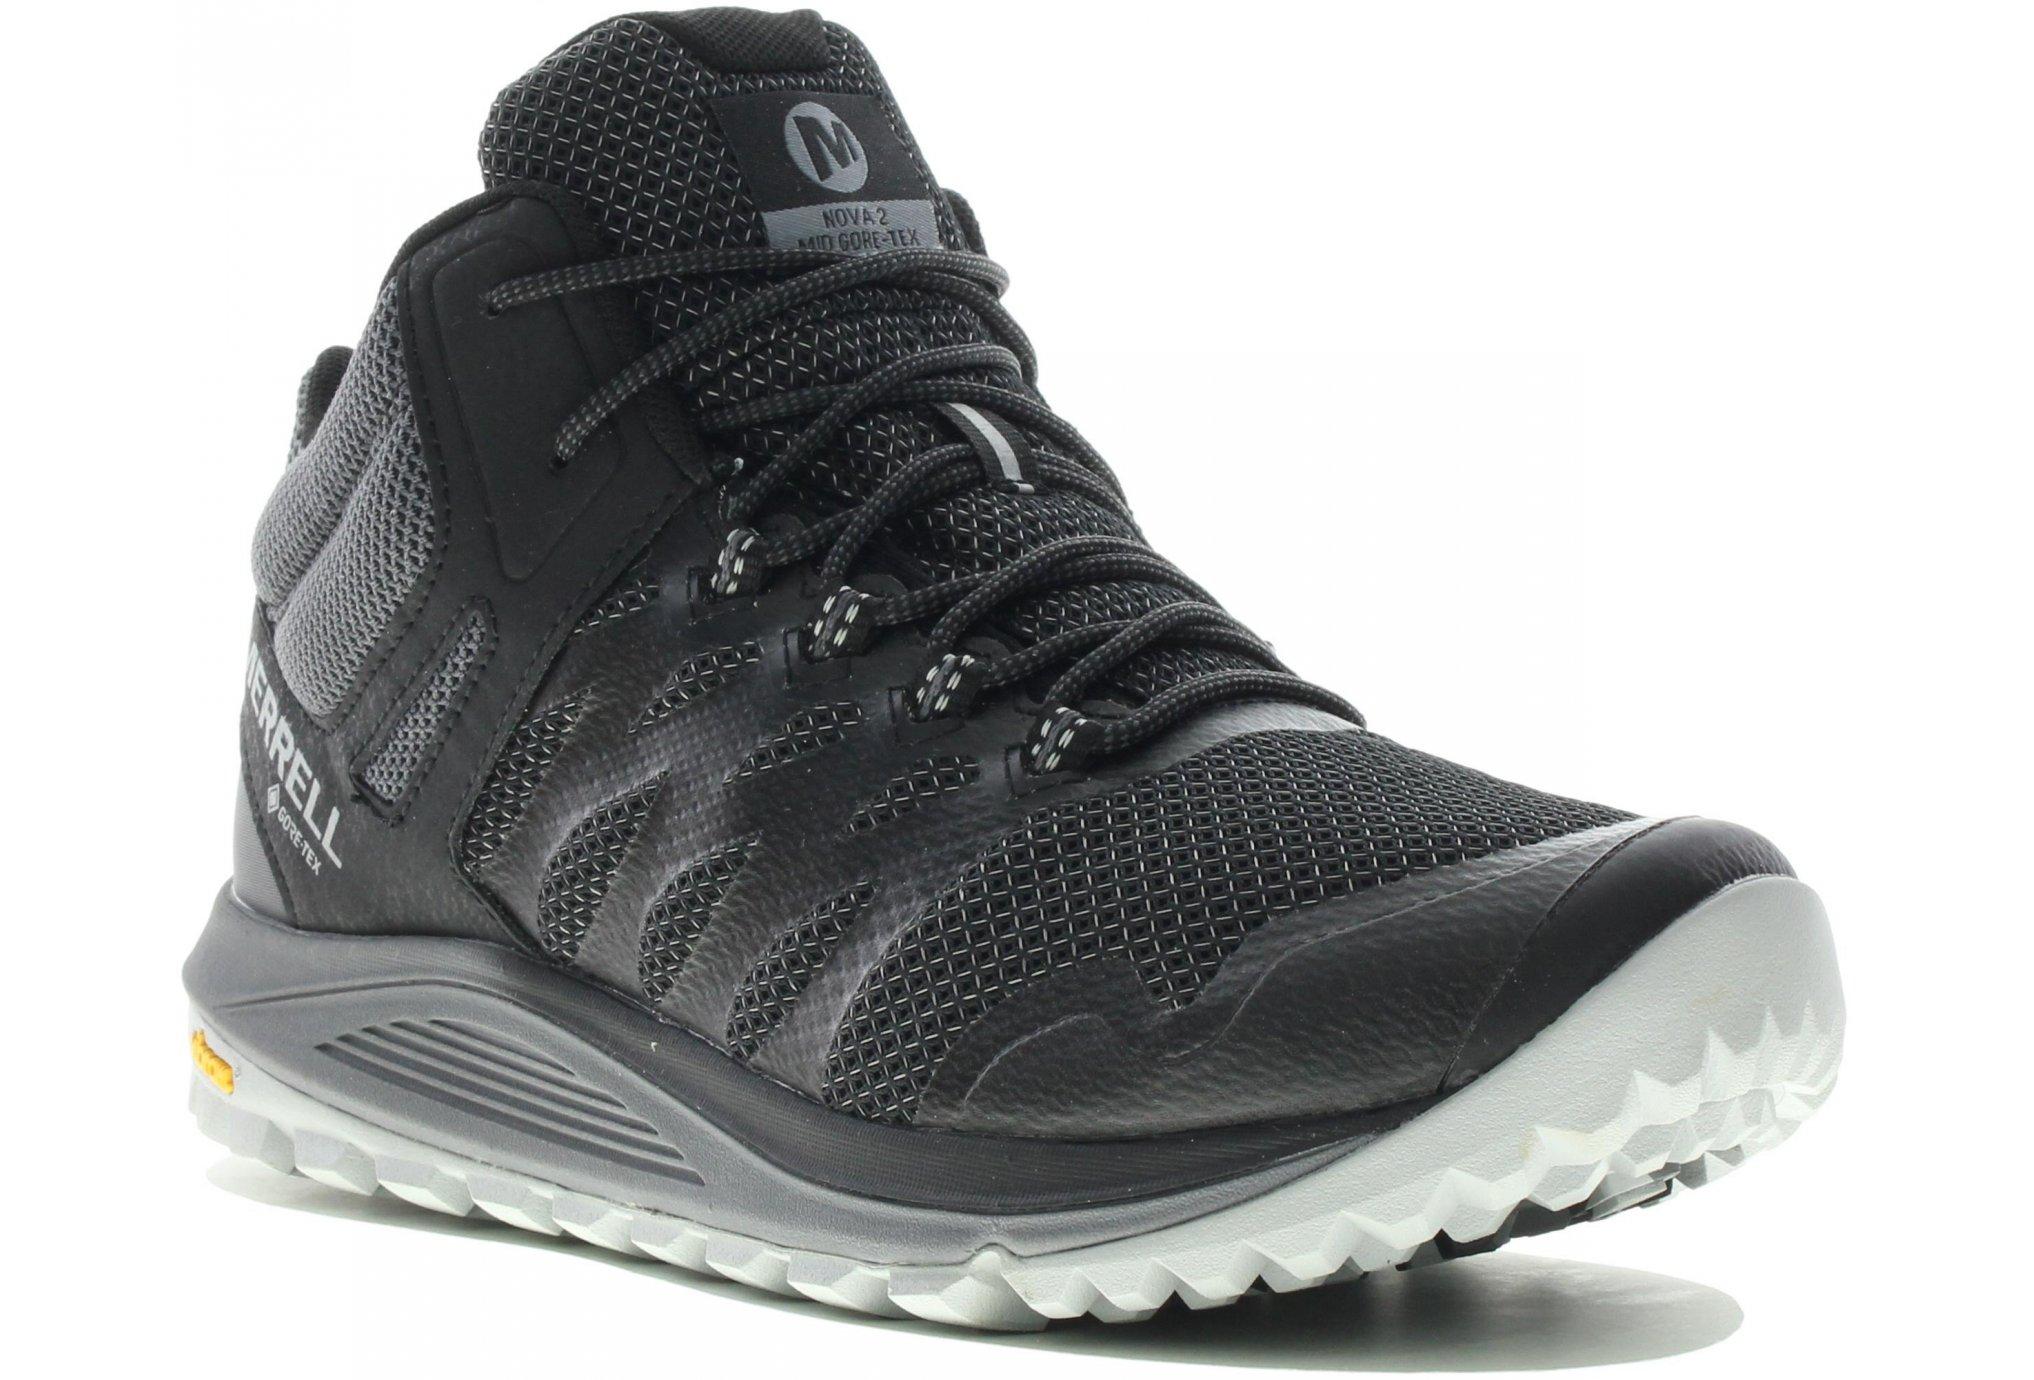 Merrell Nova 2 Mid Gore-Tex M Chaussures homme